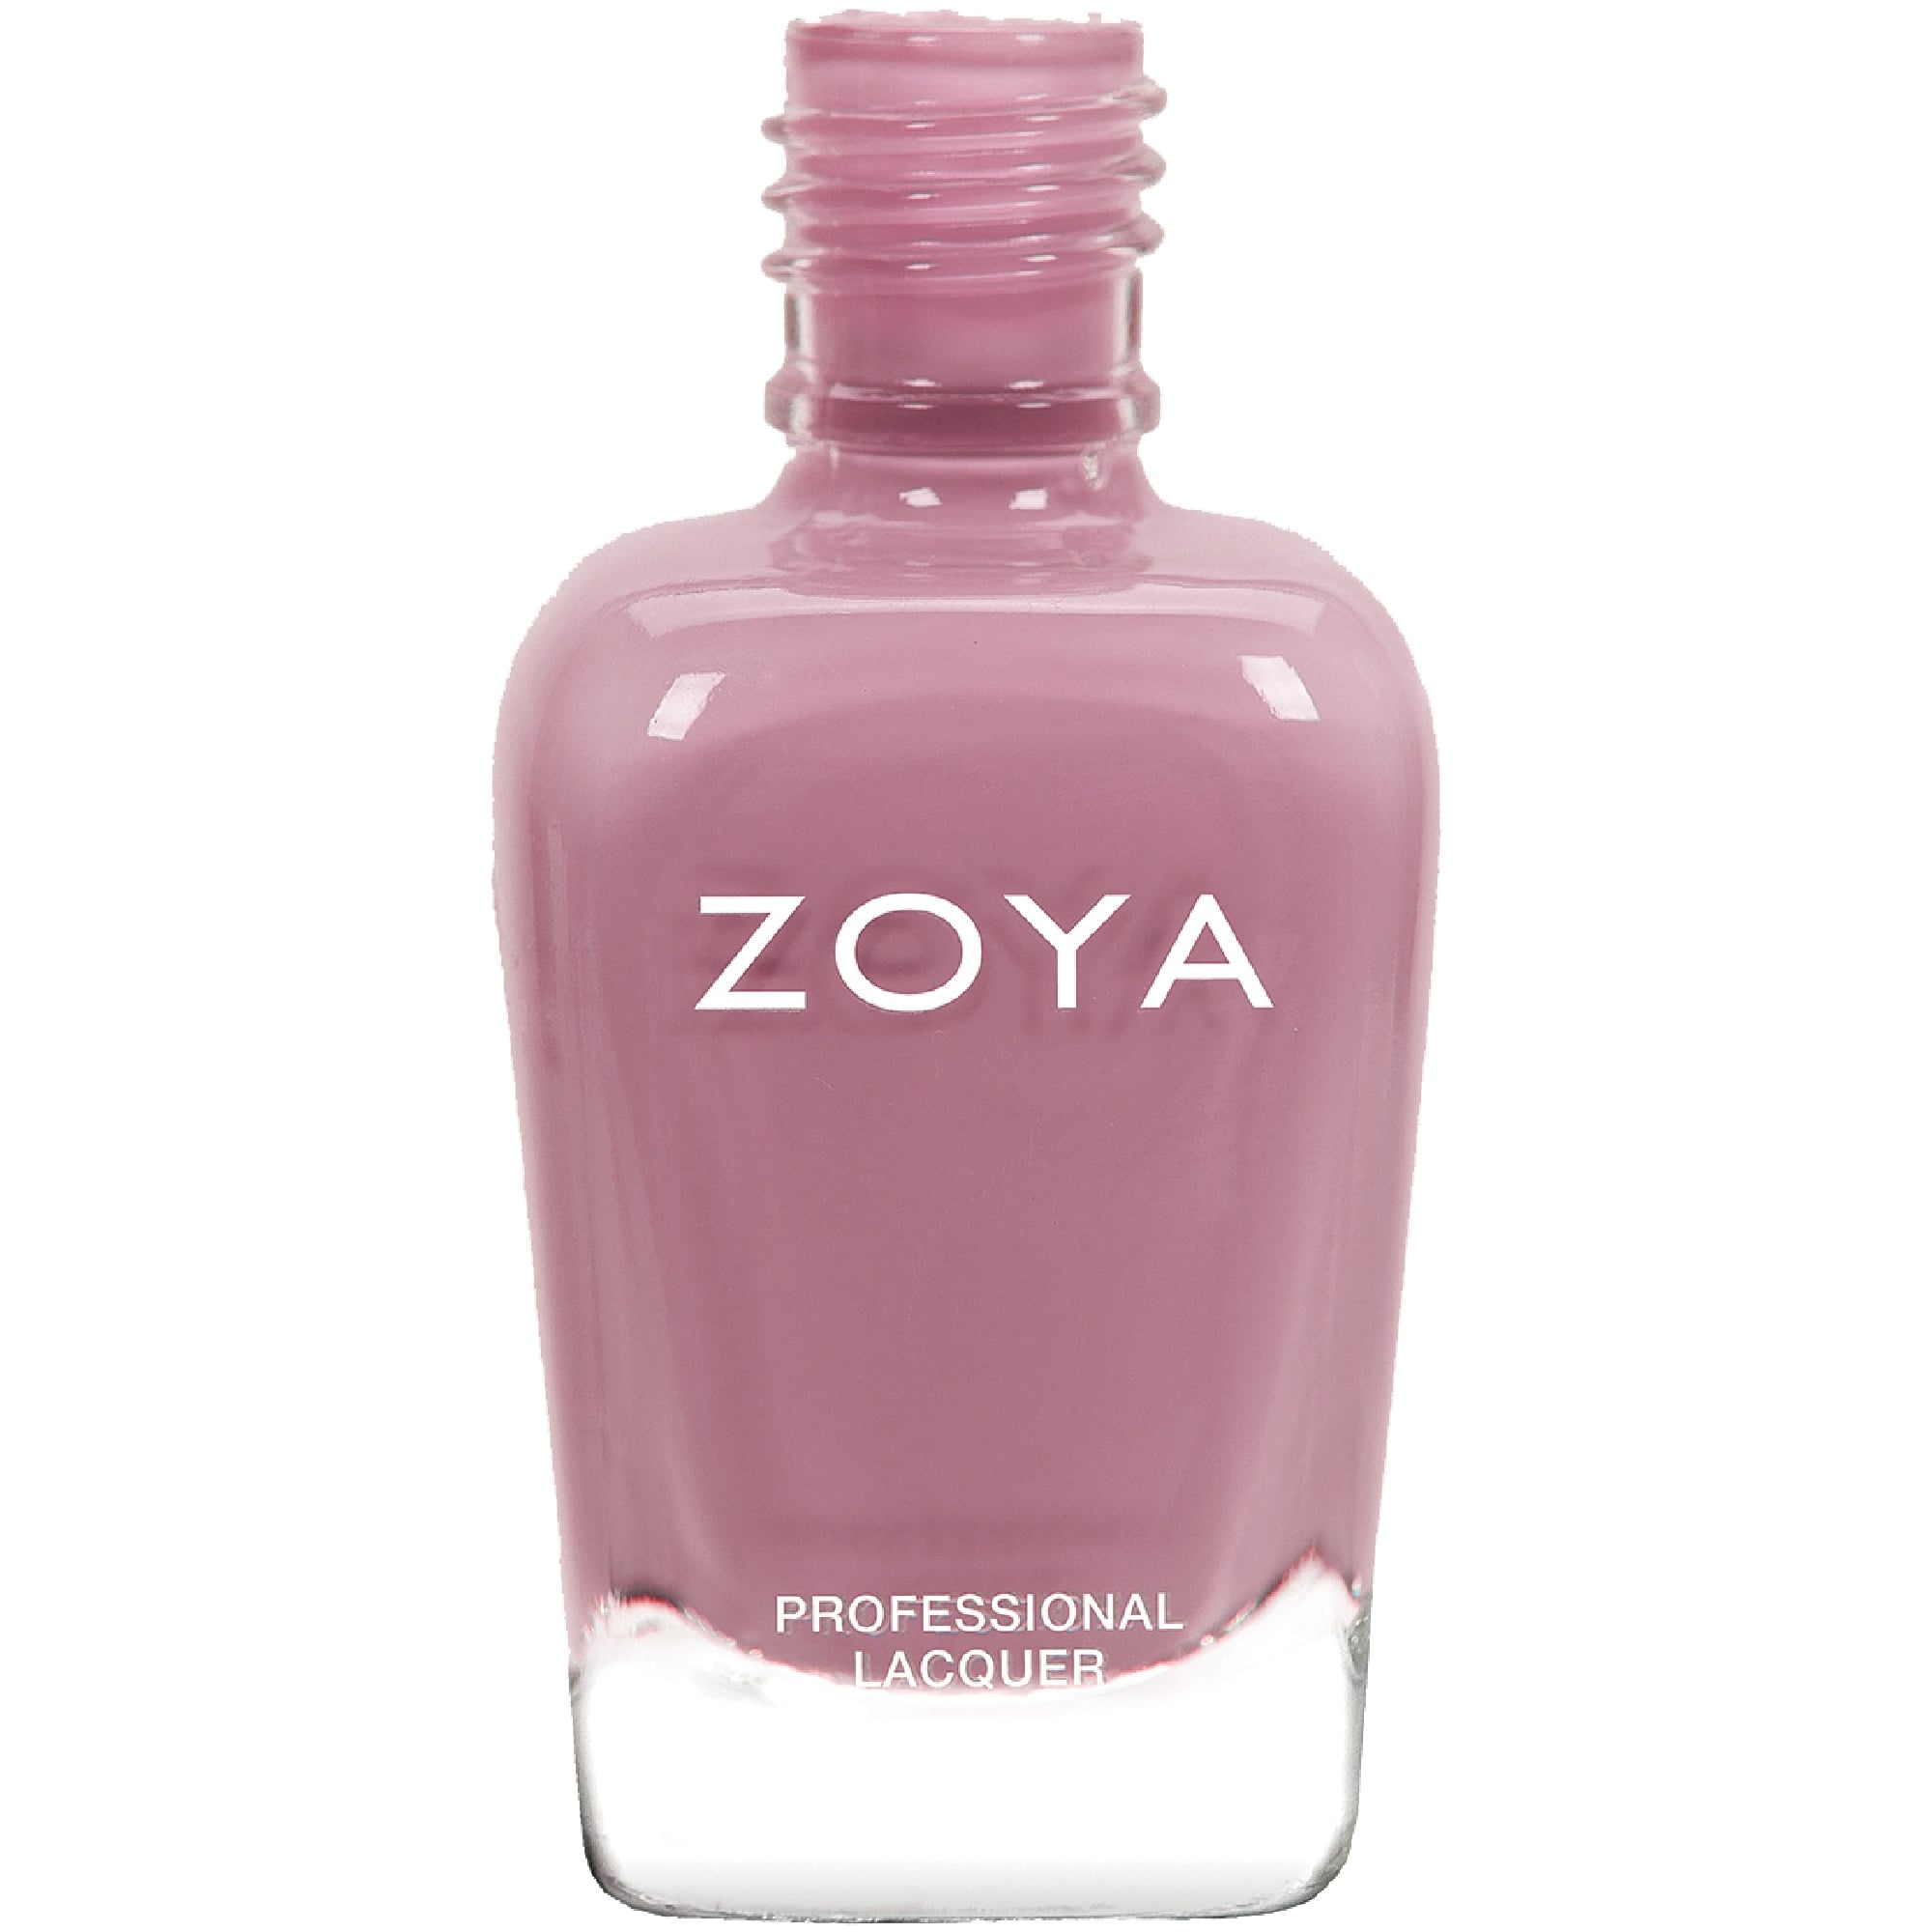 Zoya Sophisticates 2017 Nail Polish Collection